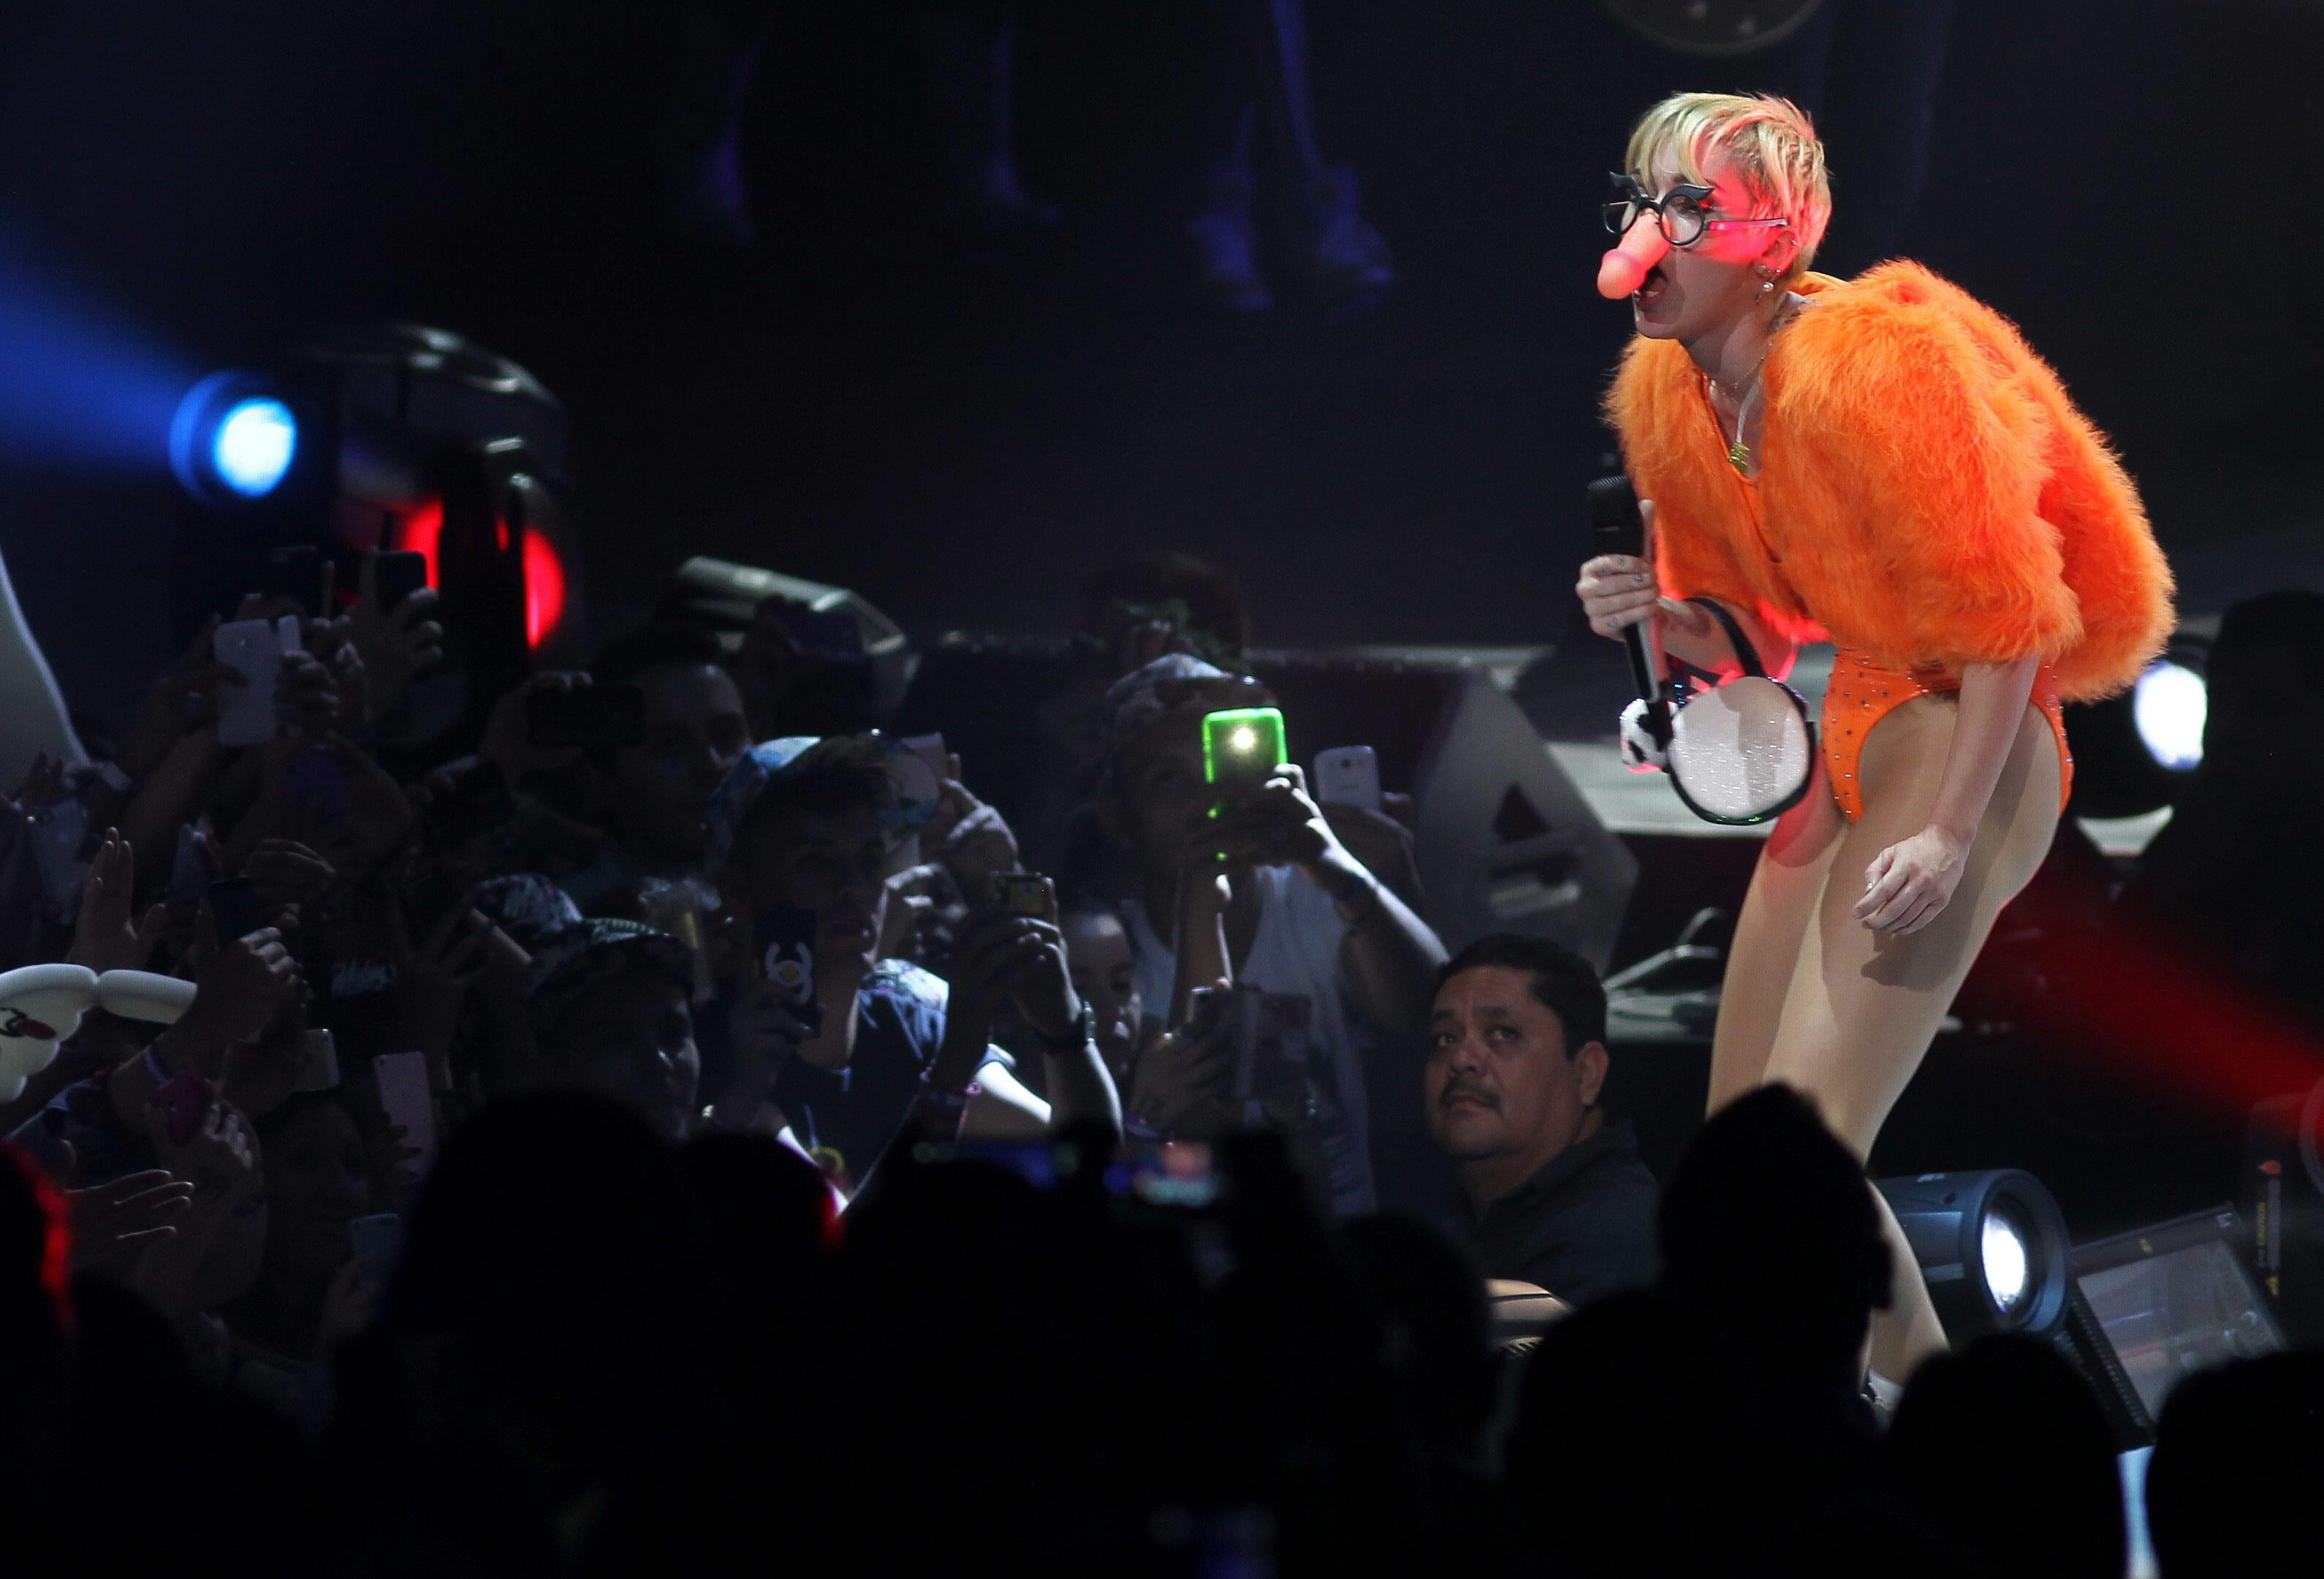 US singer Miley Cyrus performs during a concert in Guadalajara (Mexico) 21 September 2014. EFE/Ulises Ruiz Basurto